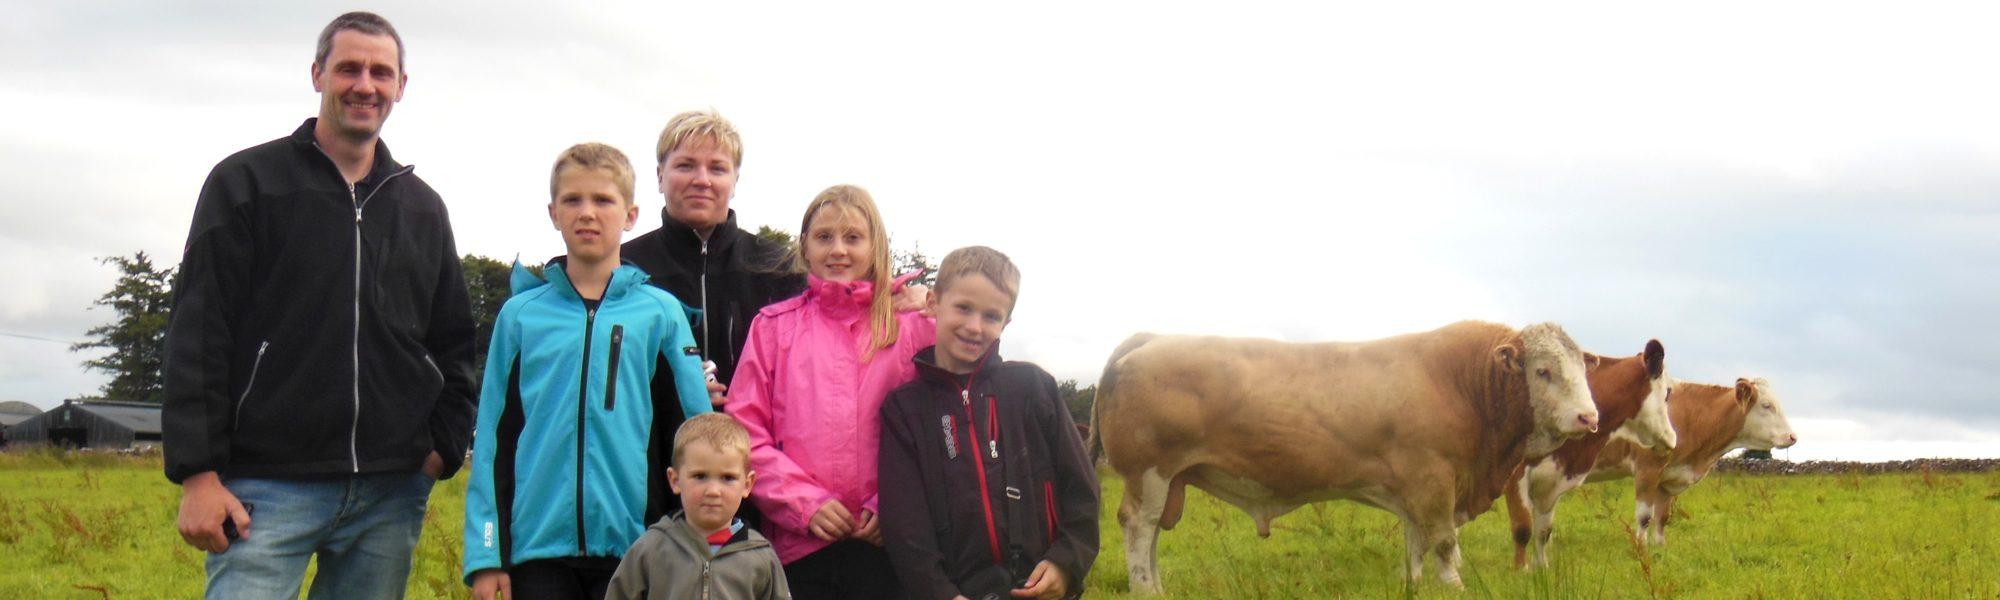 generation family farm-fedal simmental denmark